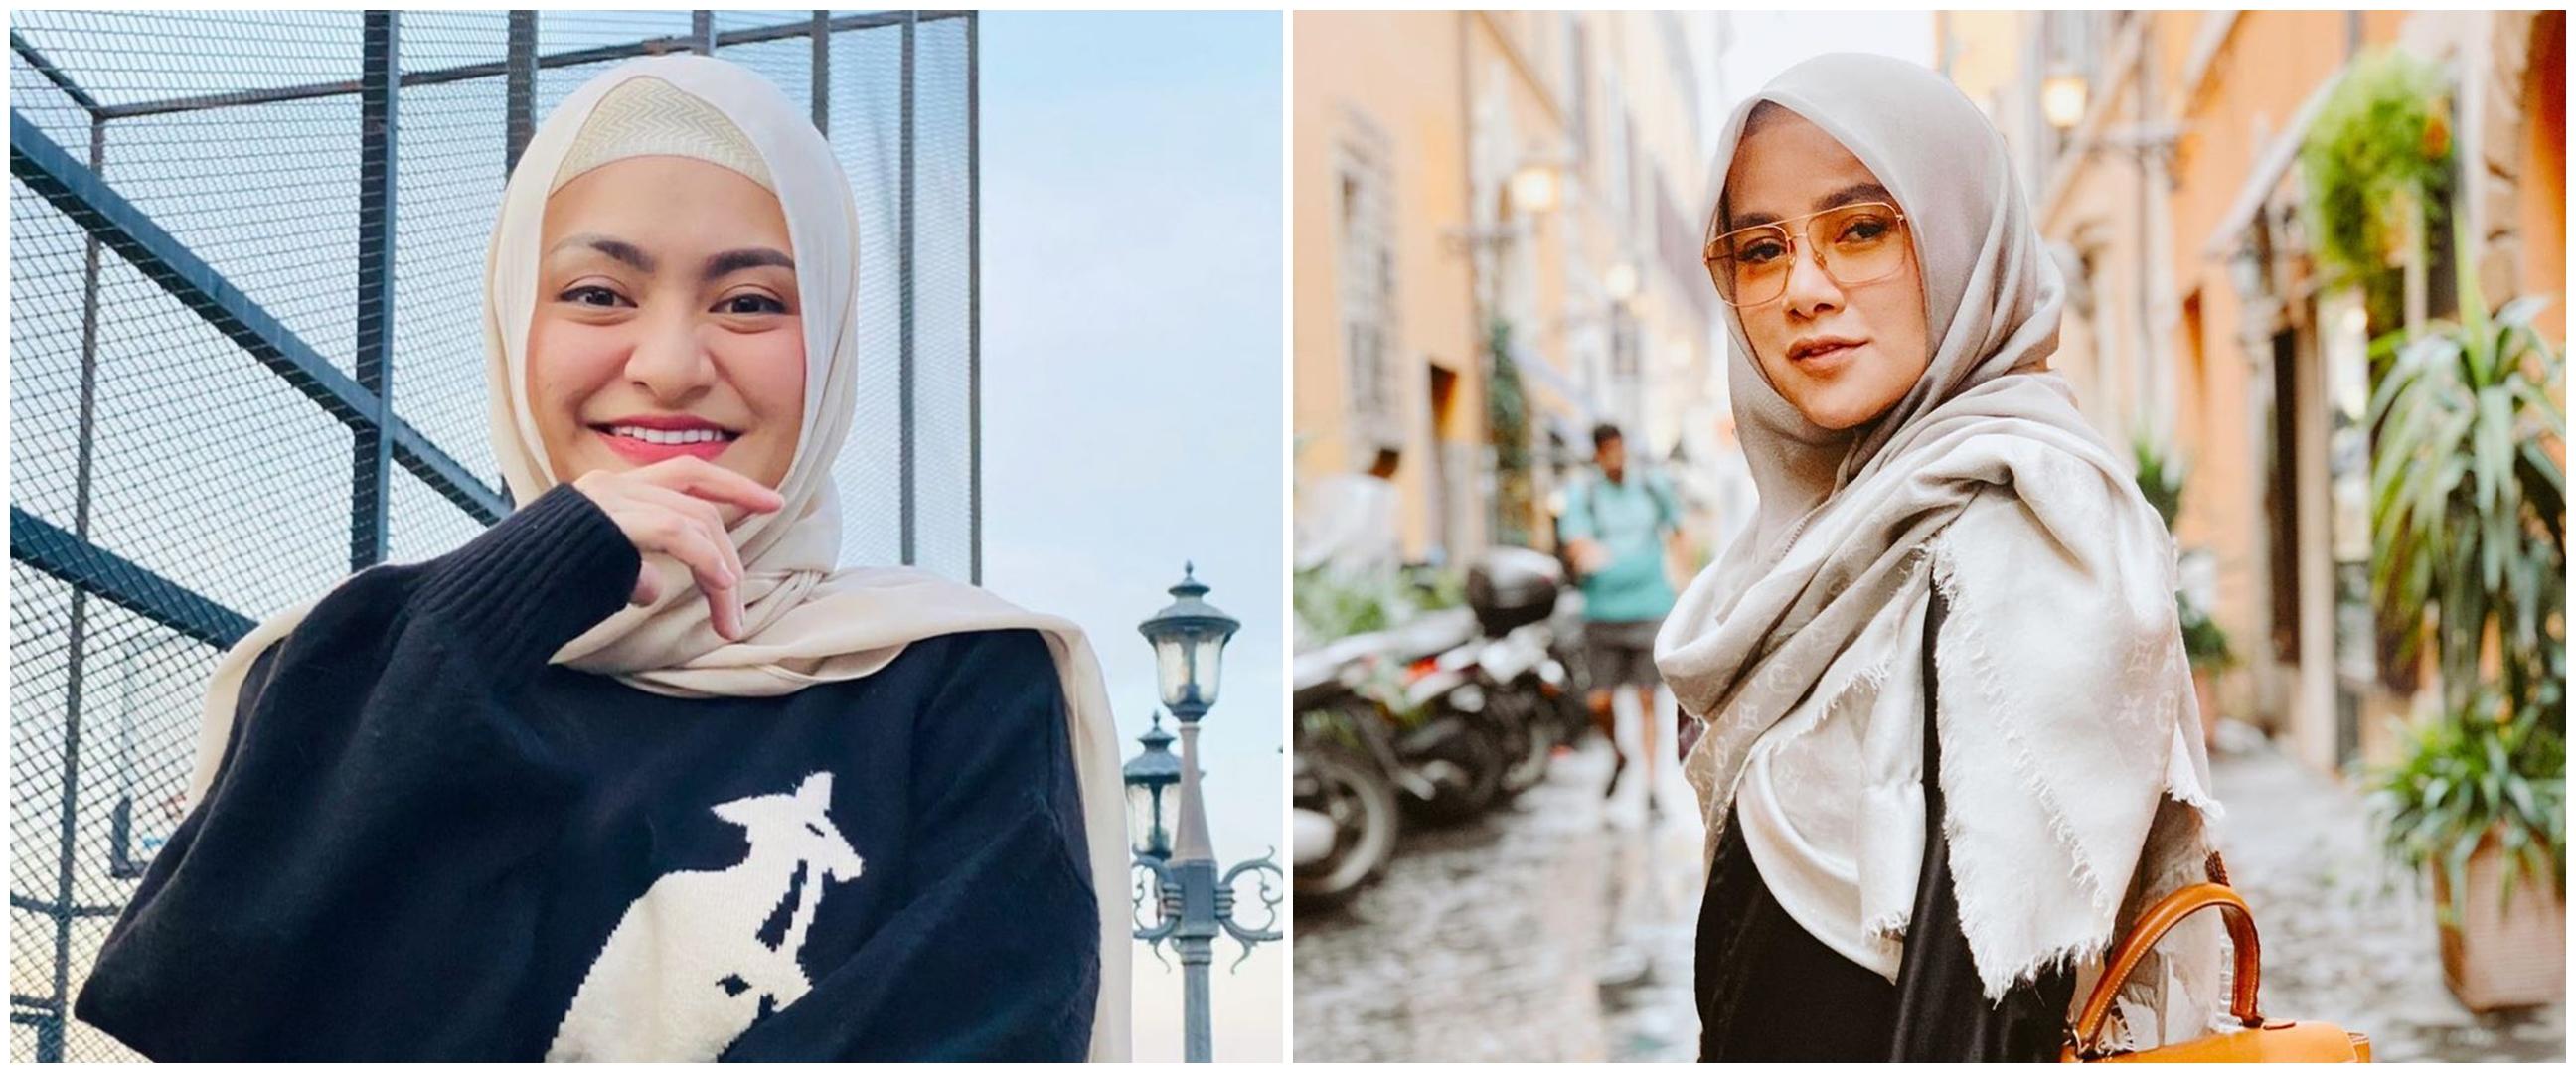 Cerita inspiratif 4 seleb tentang pengalaman hijrah, mualaf, dan tato